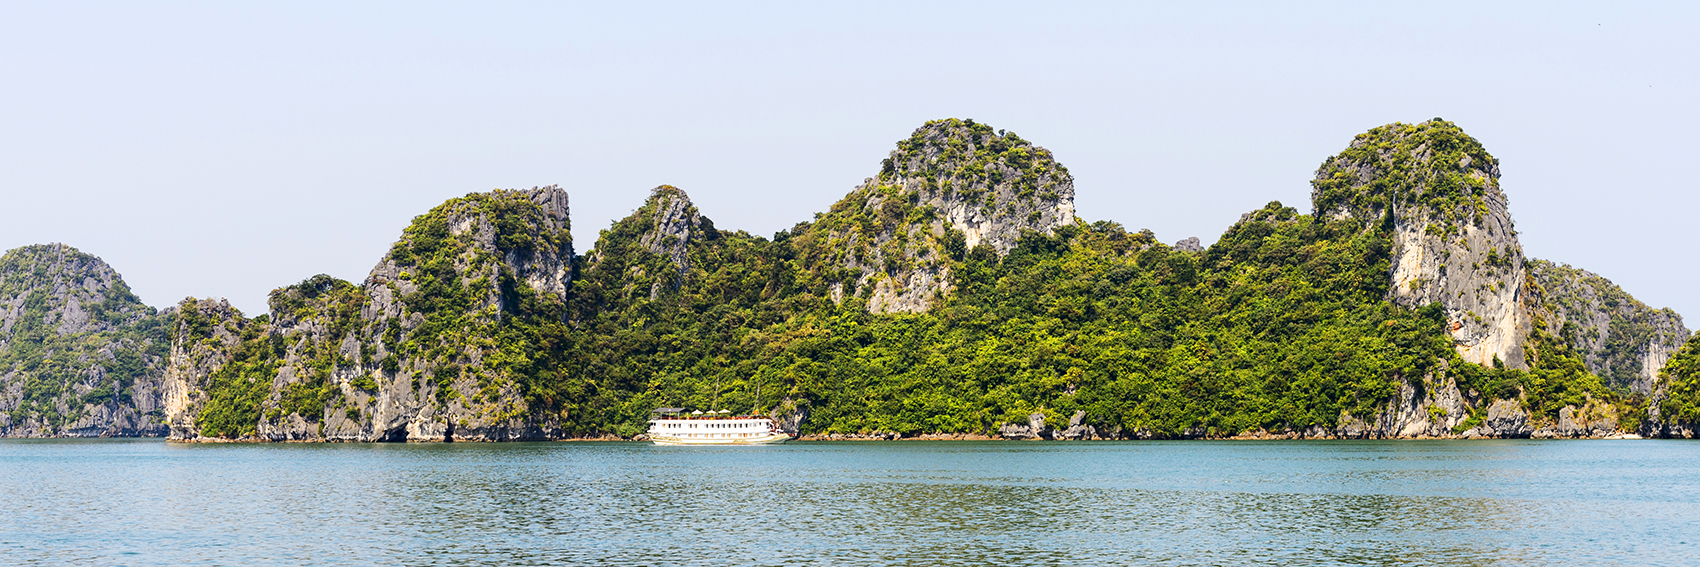 Jonque Image - Baie d'Halong